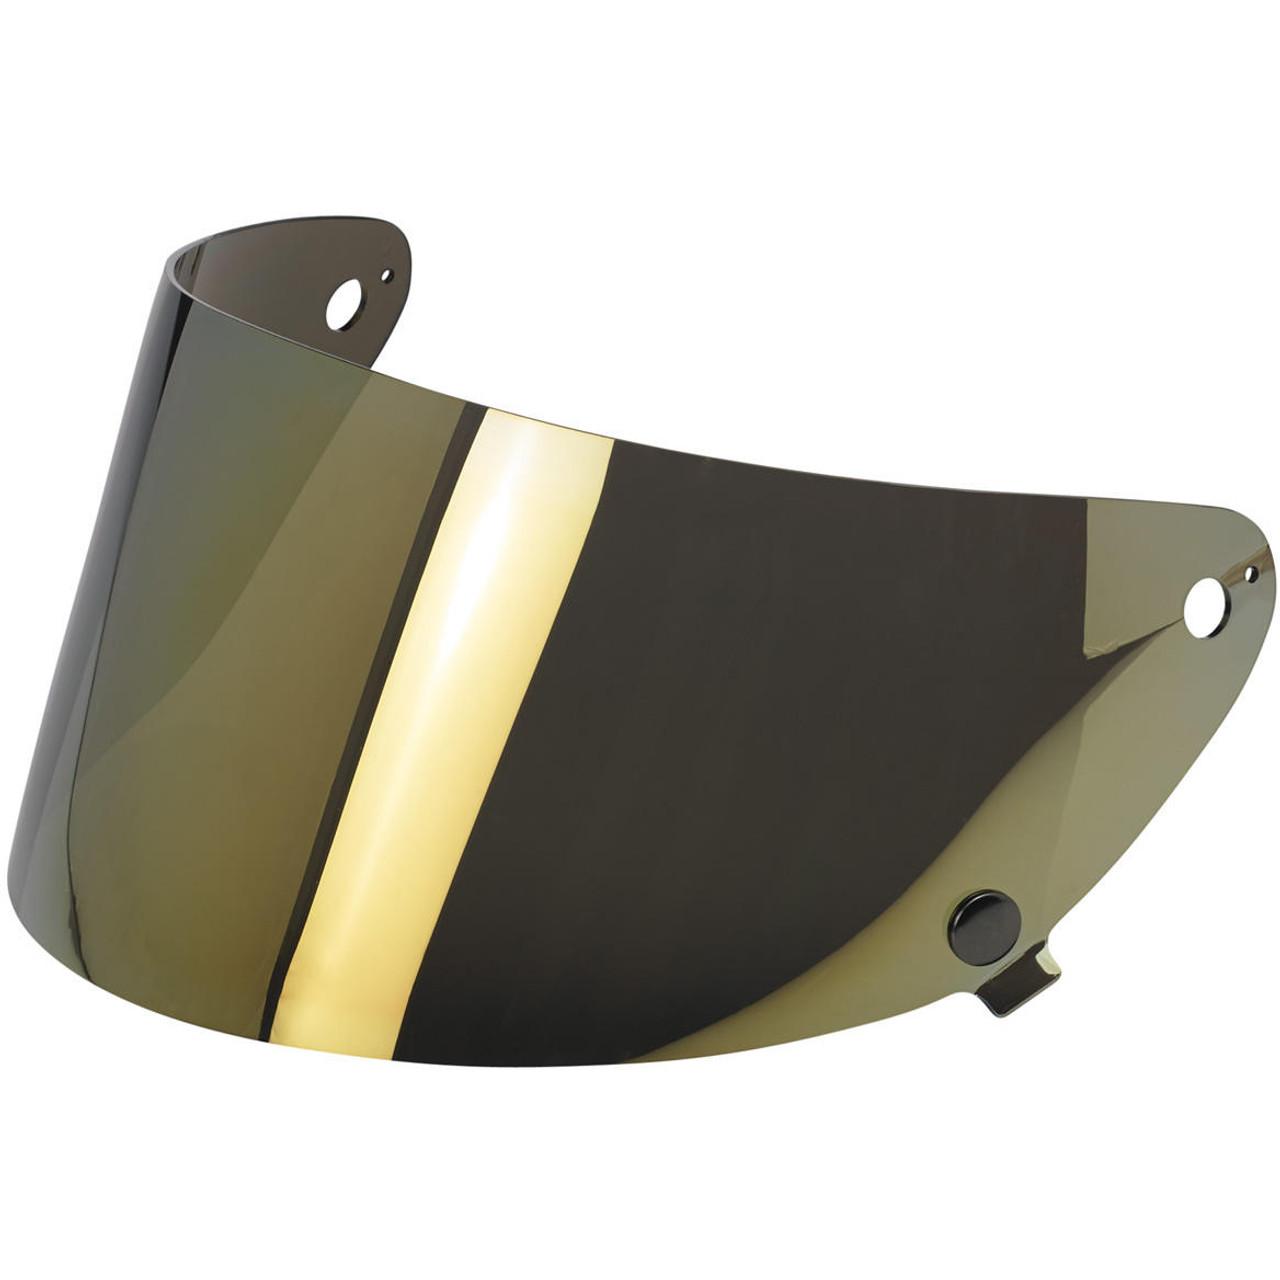 5136d9d4 Biltwell Gringo S Flat Shield - Lite Mirror for Biltwell Gringo S ...